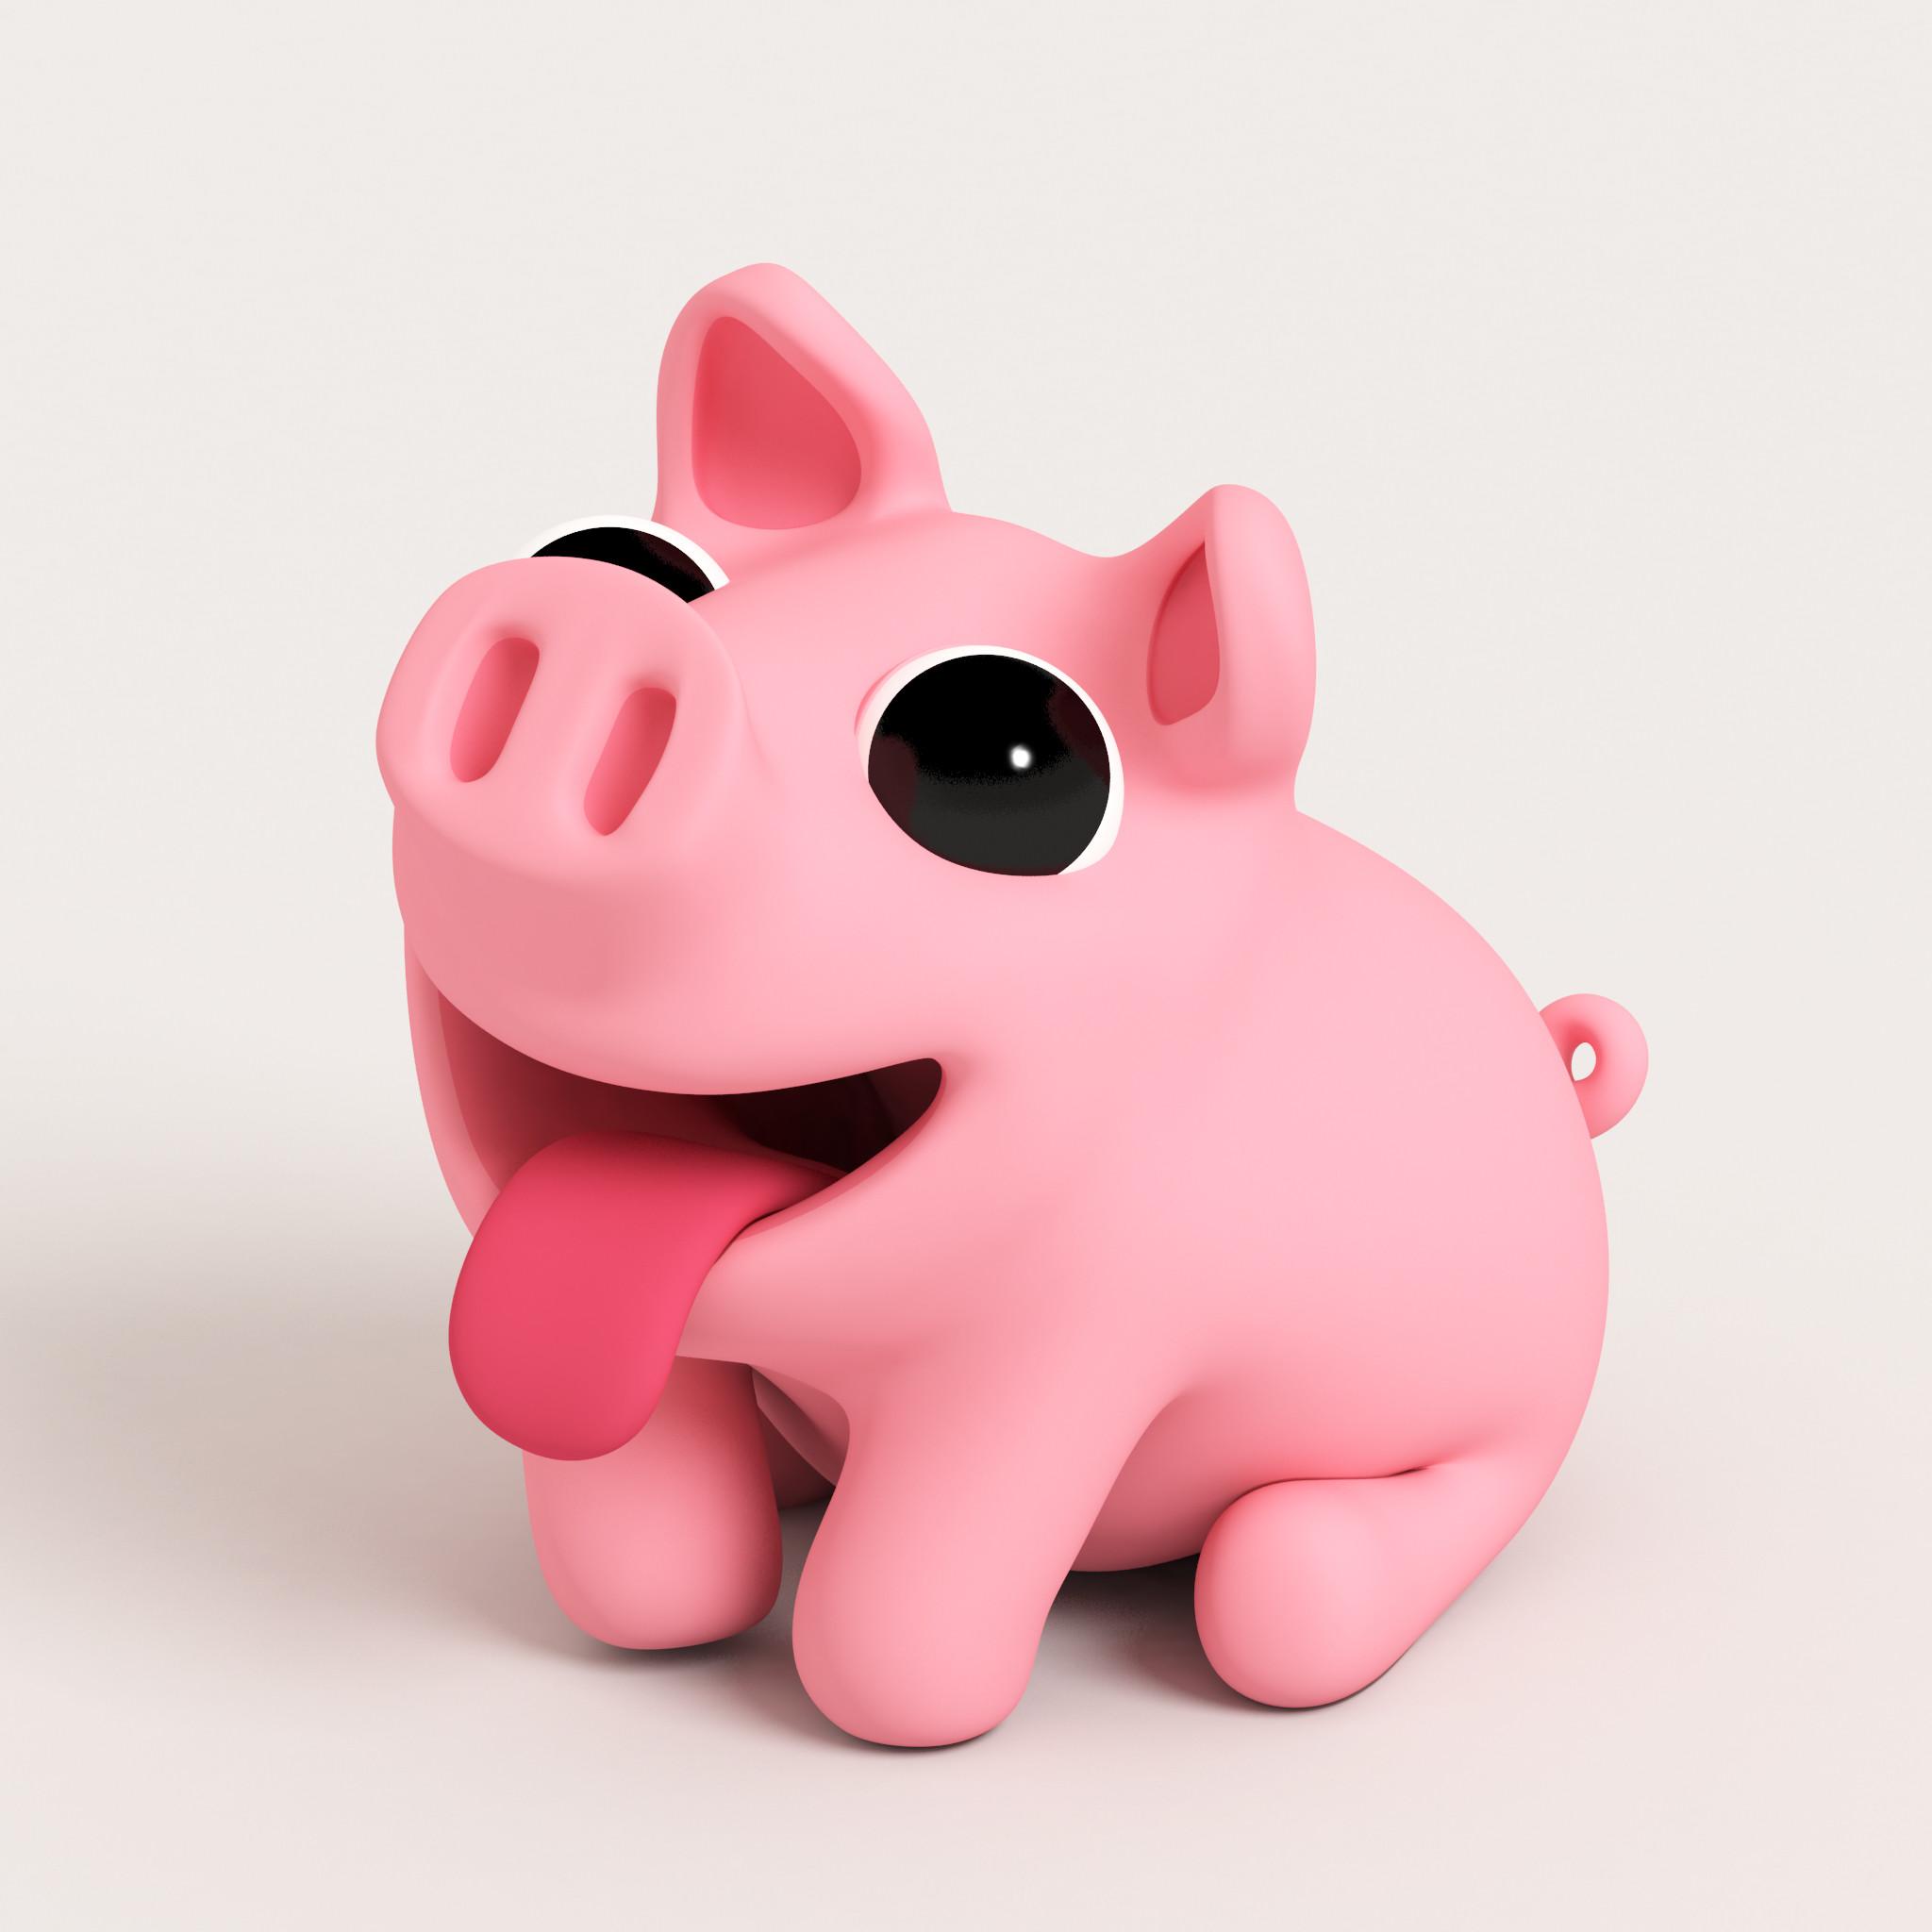 Cute Pink Wallpaper For Mobile Piggy Wallpaper 183 ①